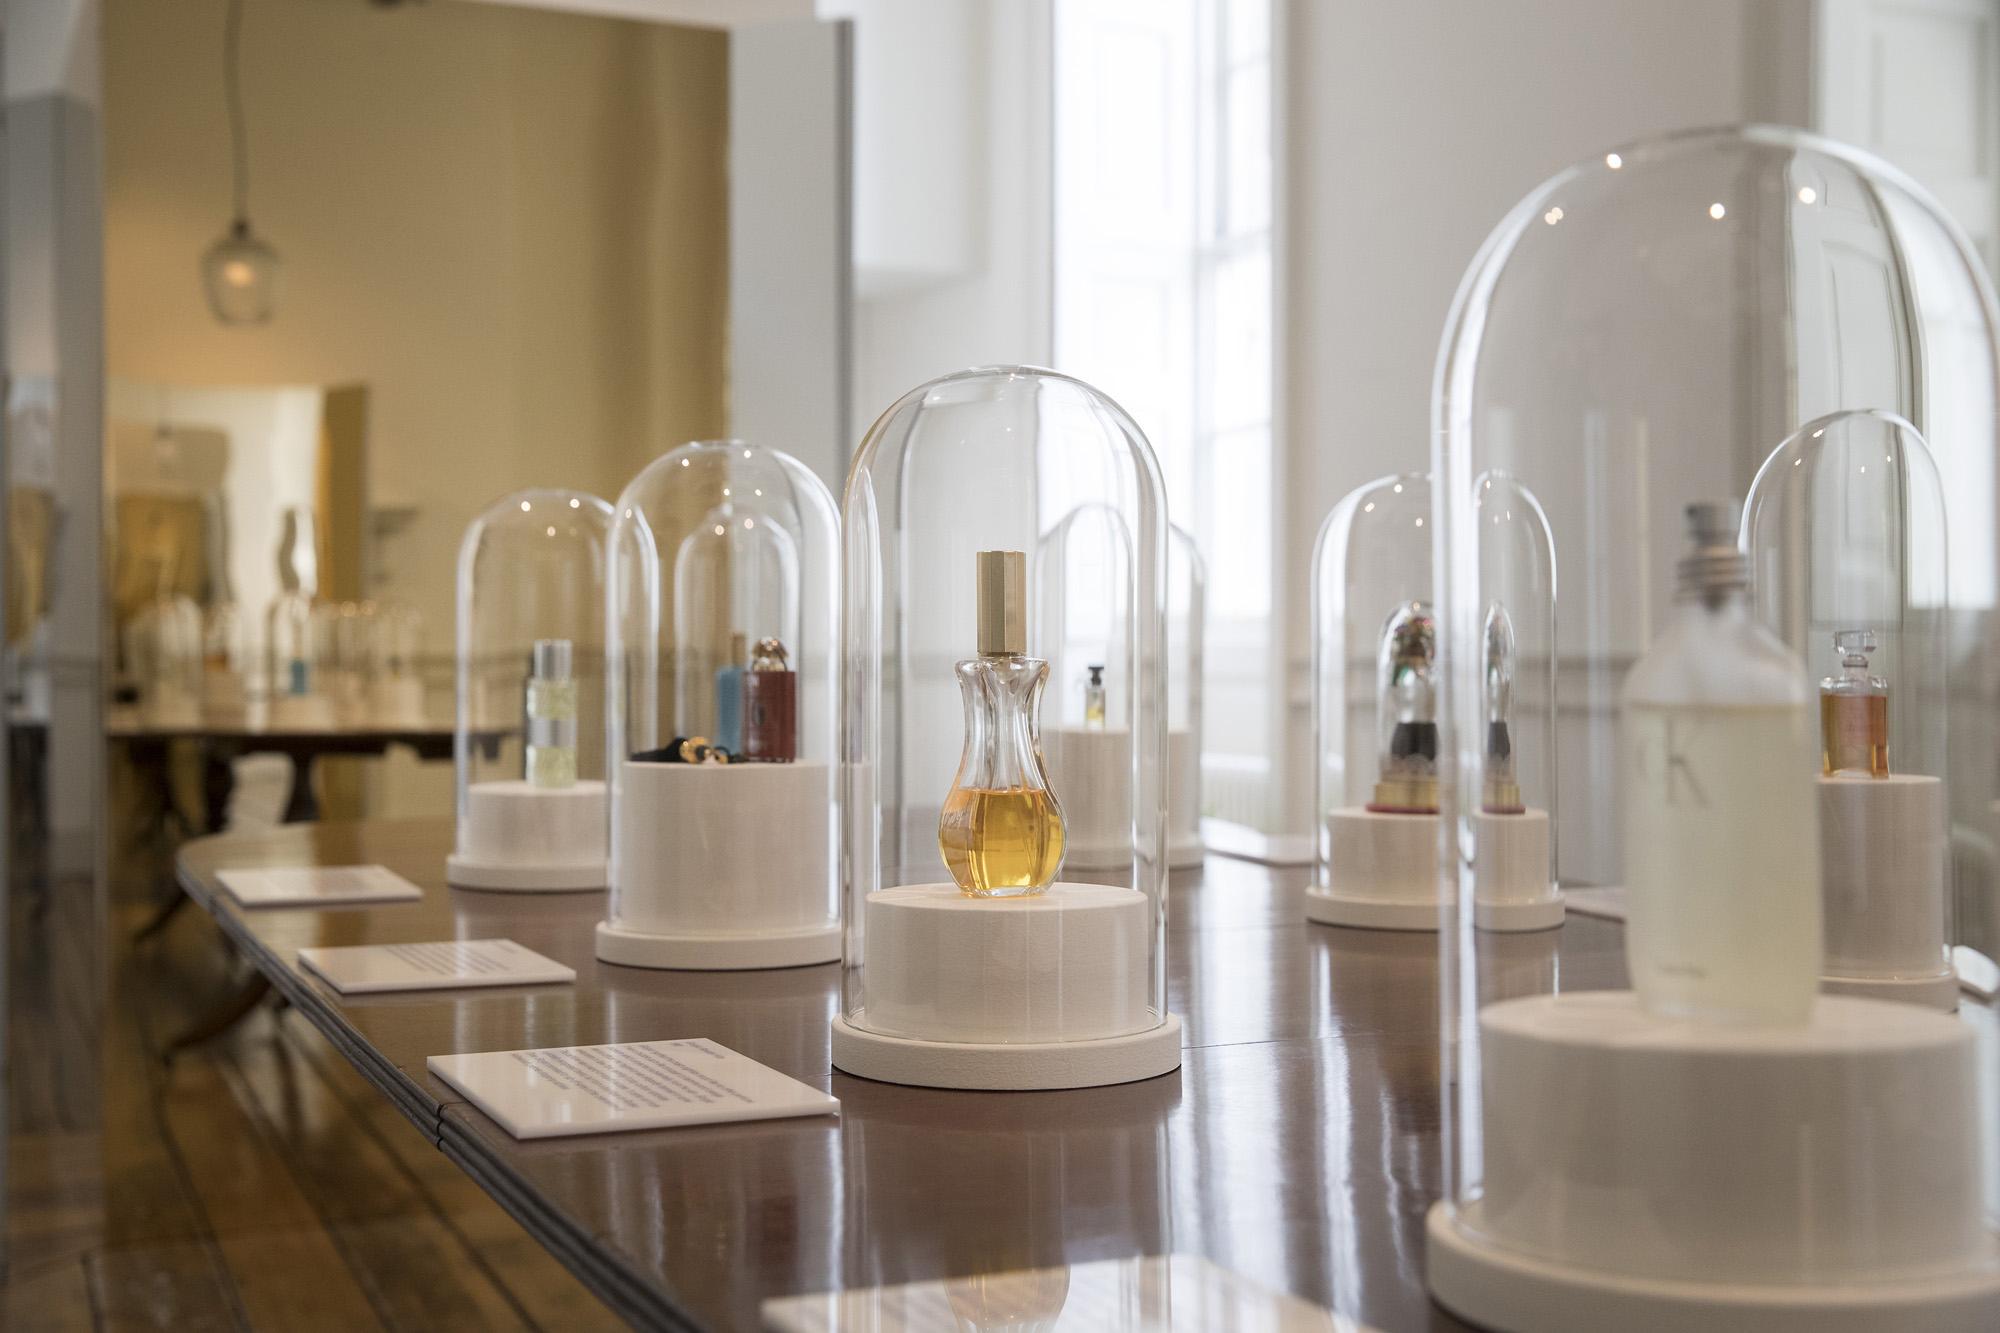 Somerset house perfume exhibition